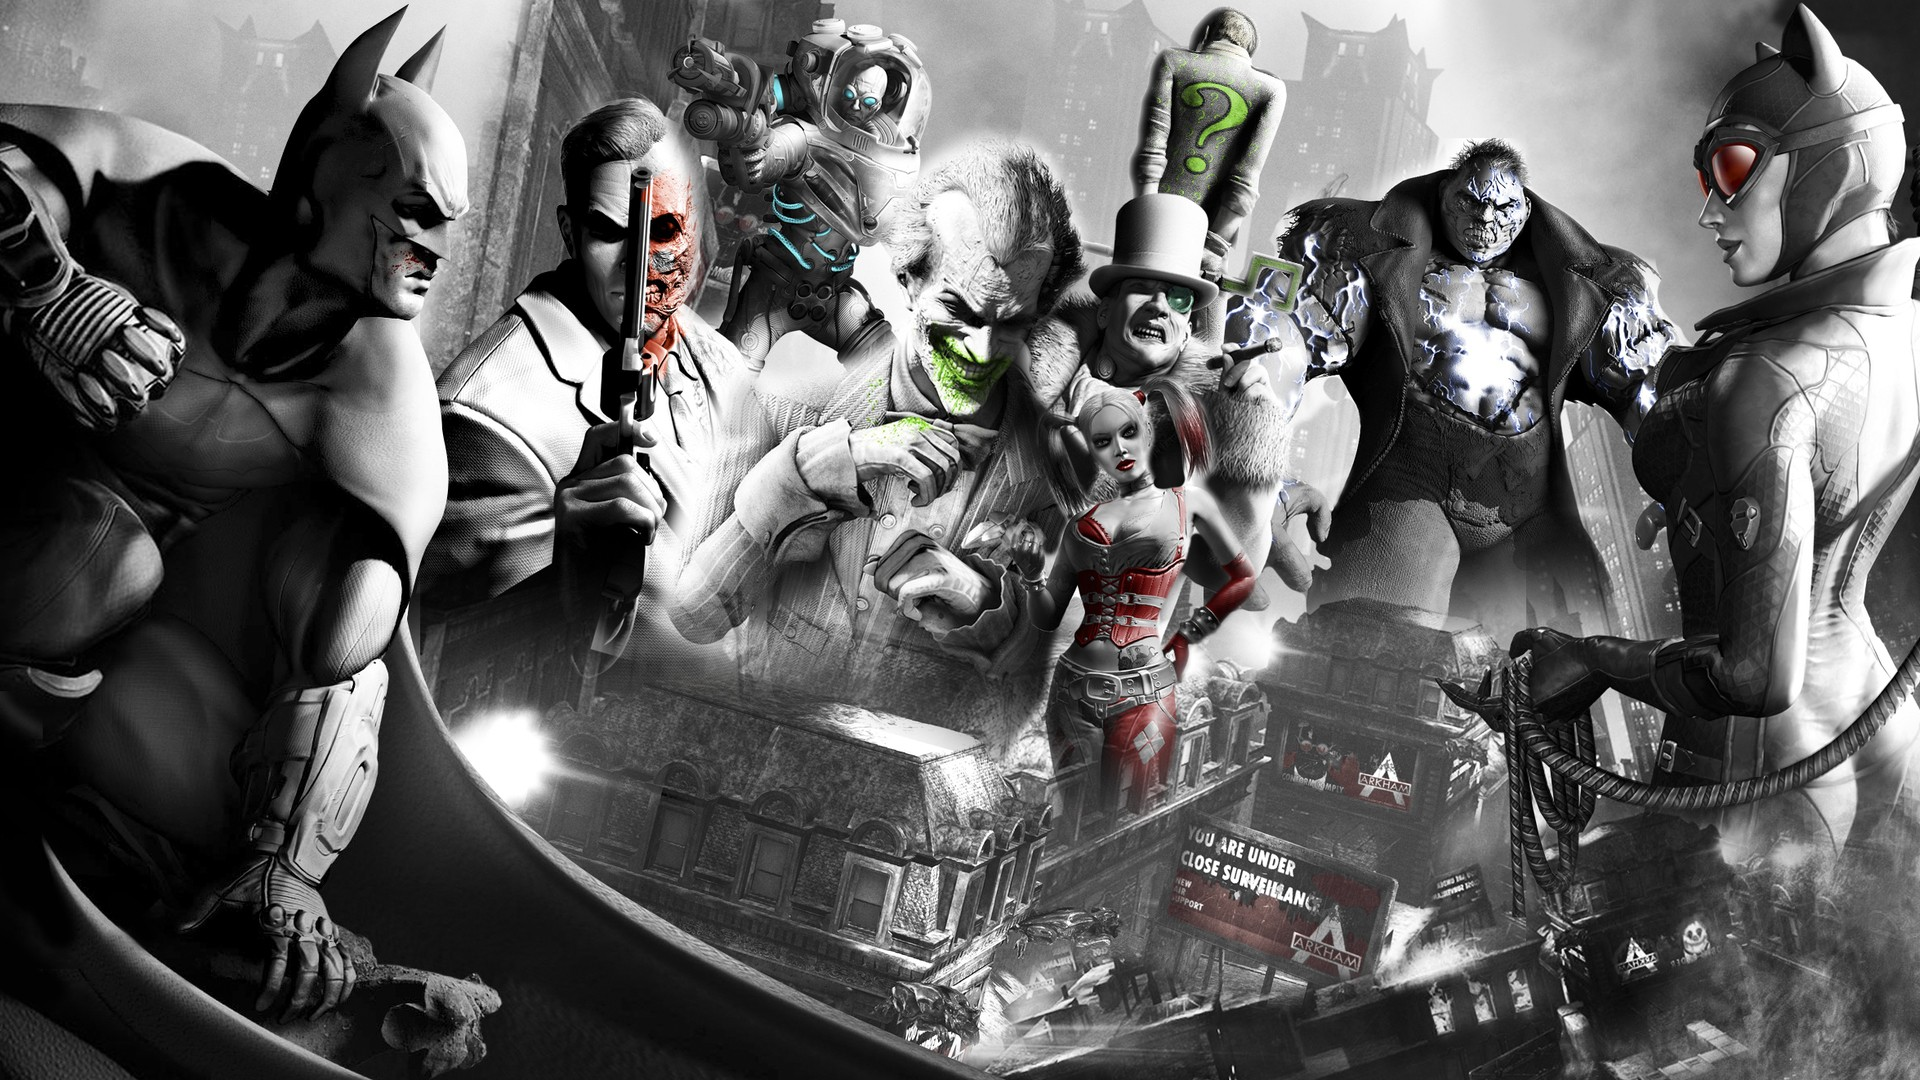 Batman Video Games The Joker Harley Quinn Catwoman Riddler Arkham Asylum Harvey Dent Wallpaper